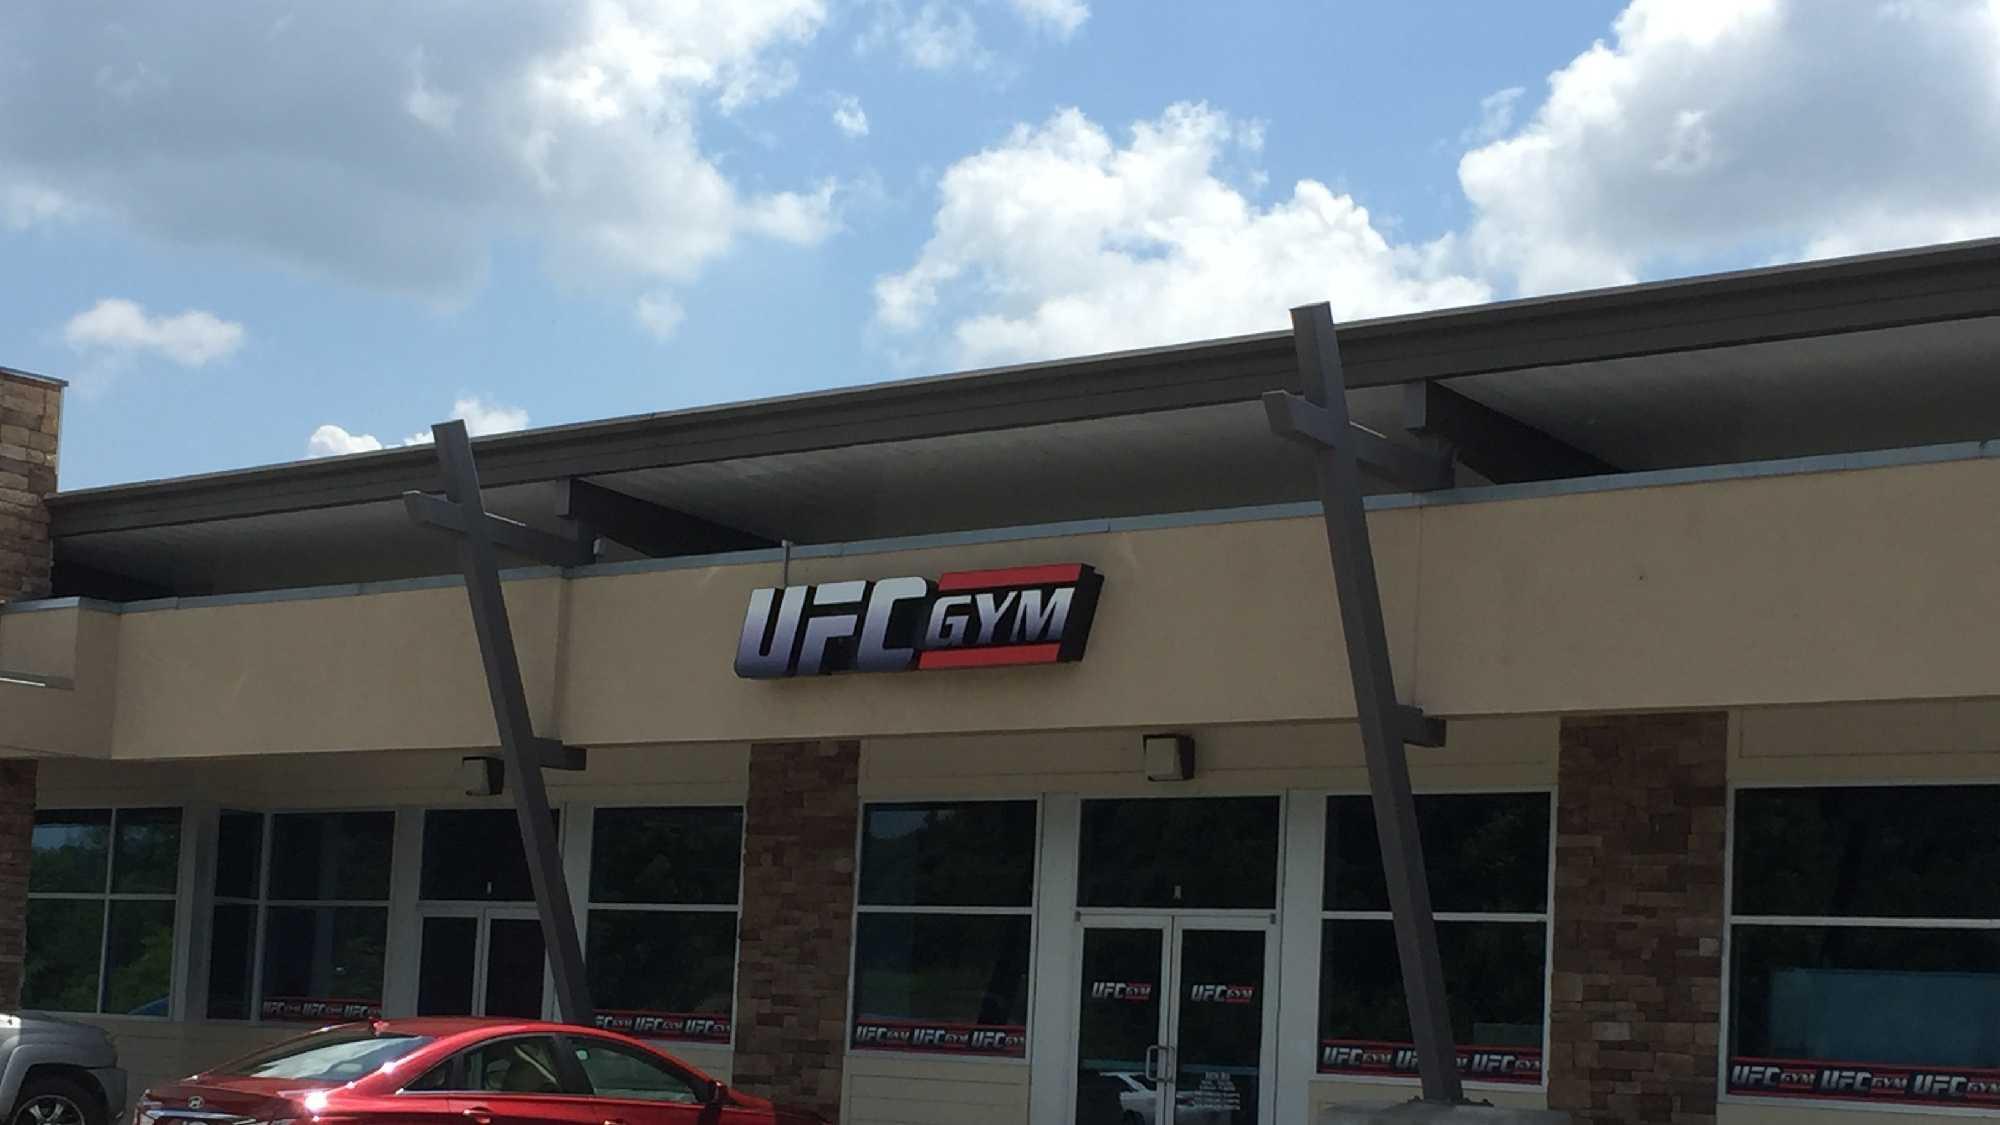 KHBS UFC gym.JPG